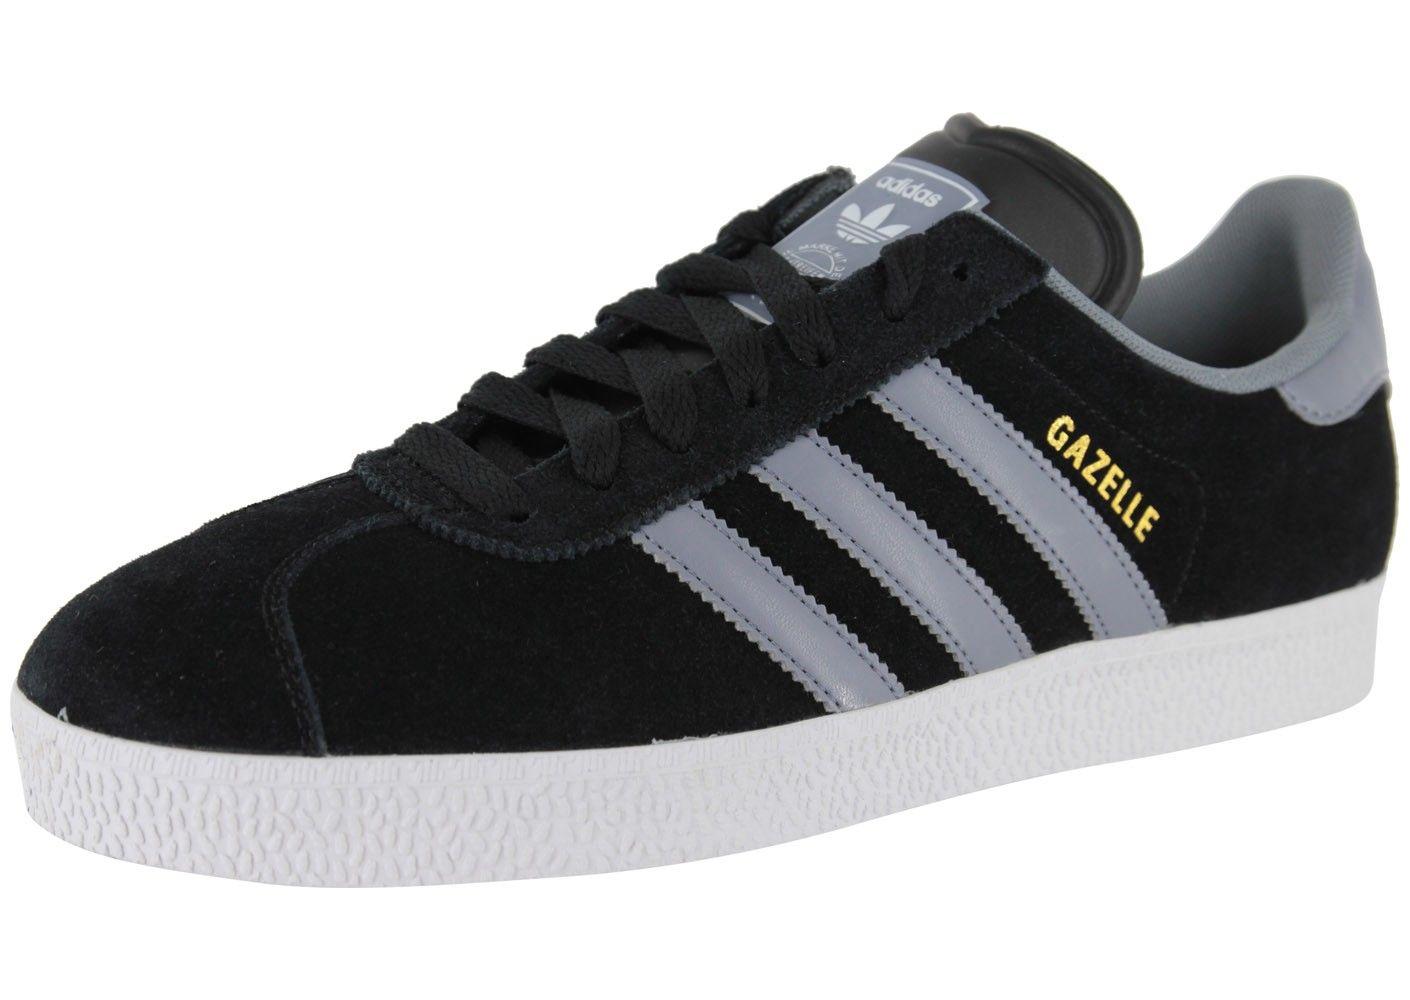 Adidas Gazelle chaussures